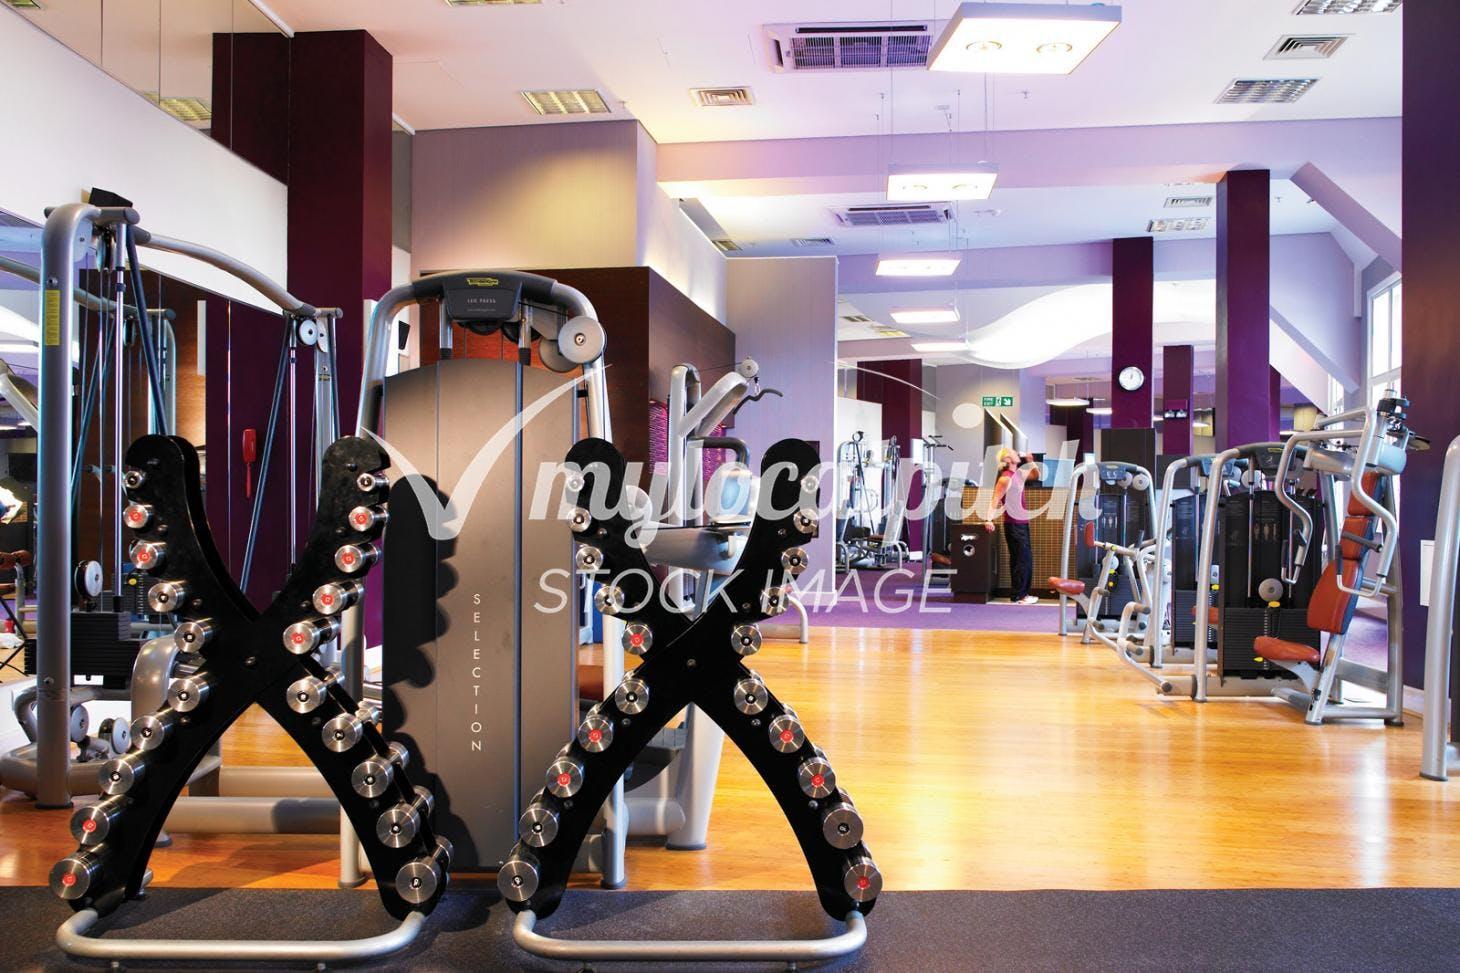 Nuffield Health Wellbeing Centre Gym gym